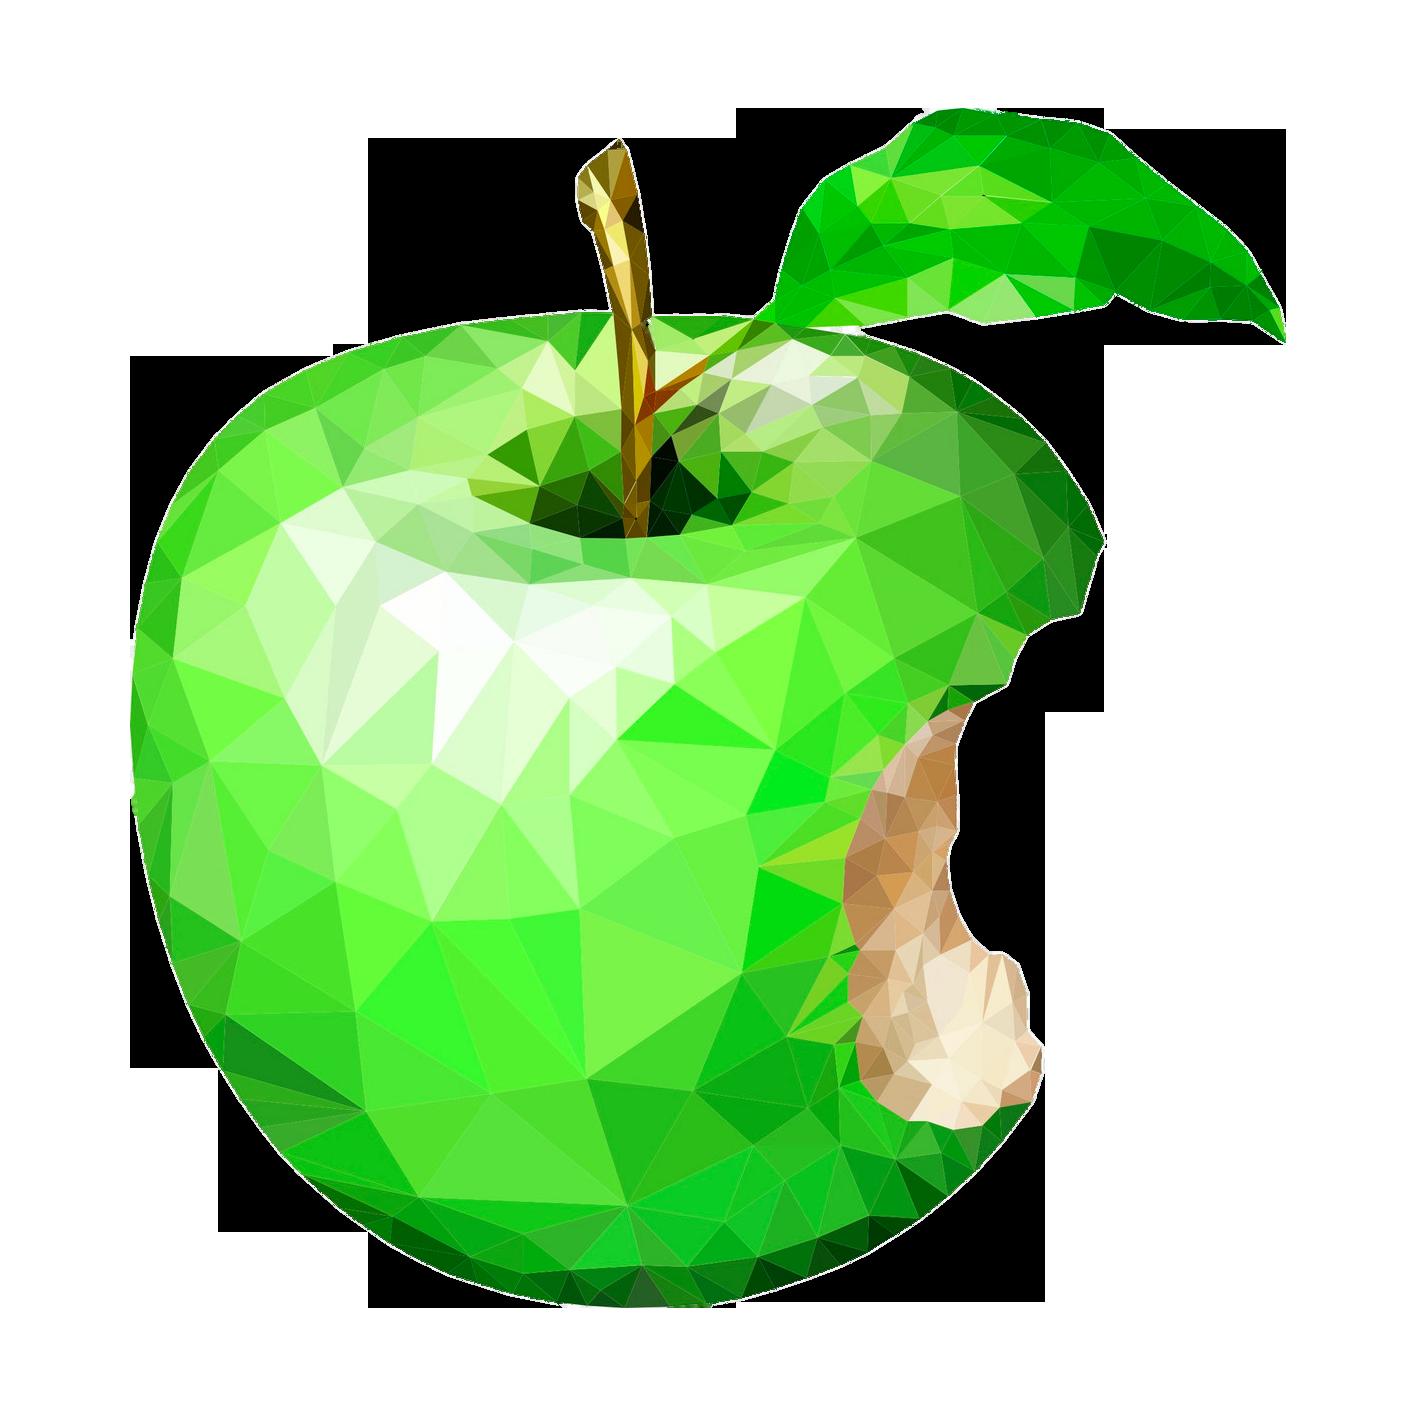 Granny smith apple tree clipart clipart freeuse stock Apple Icon Image format Icon - Creative lattice-like green apple ... clipart freeuse stock